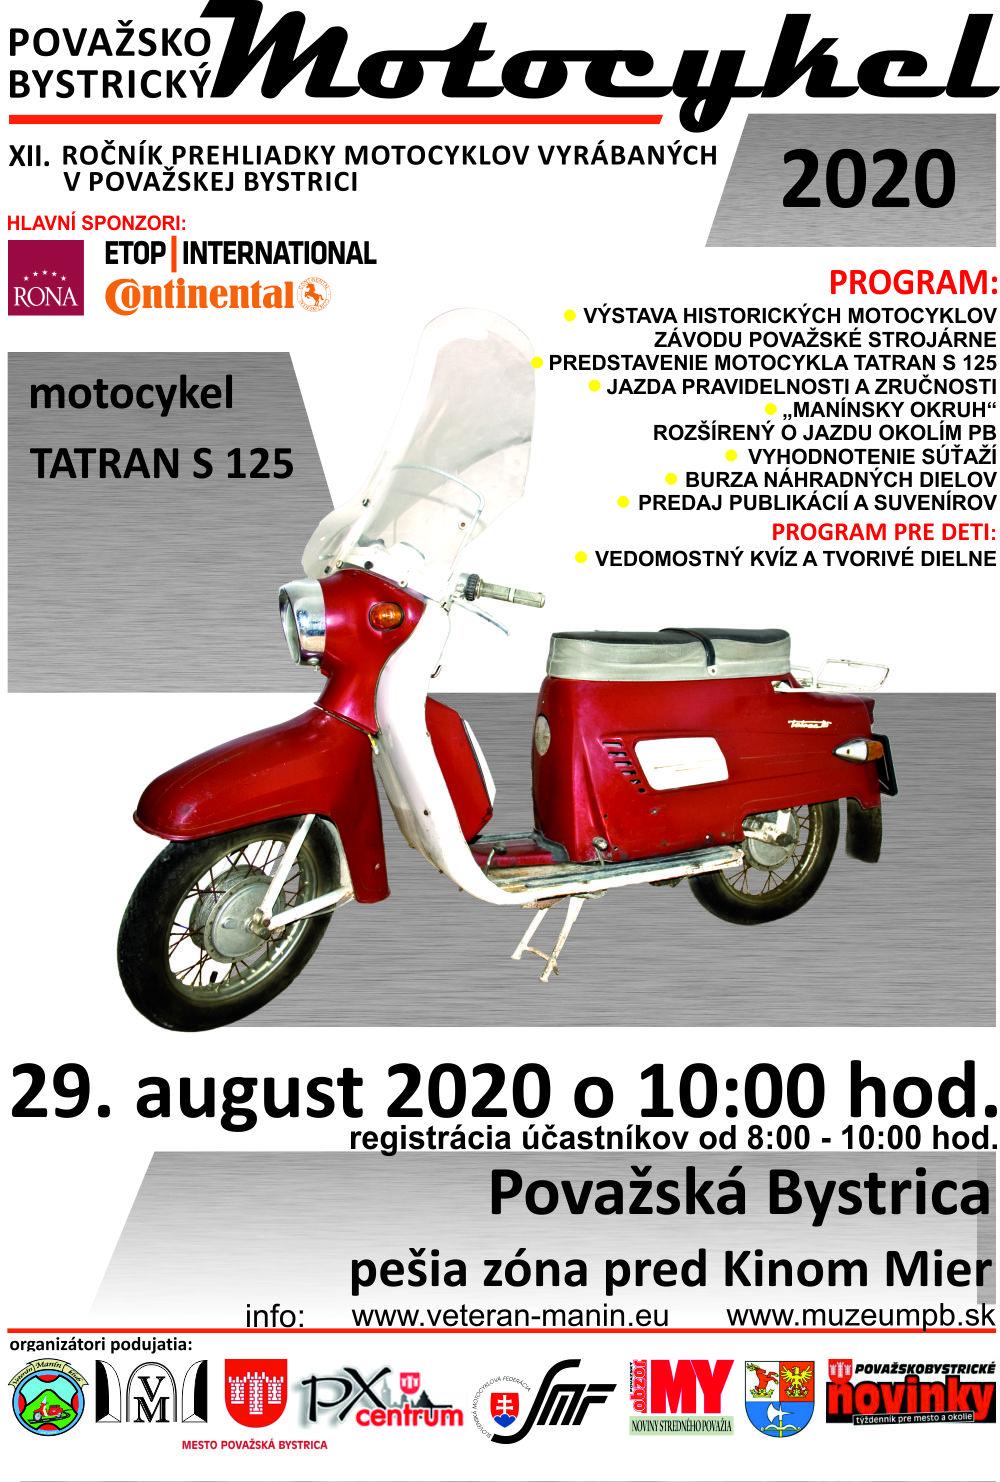 Považskobystrický-motocykel-plagát-2020-Tatran-S-125-2